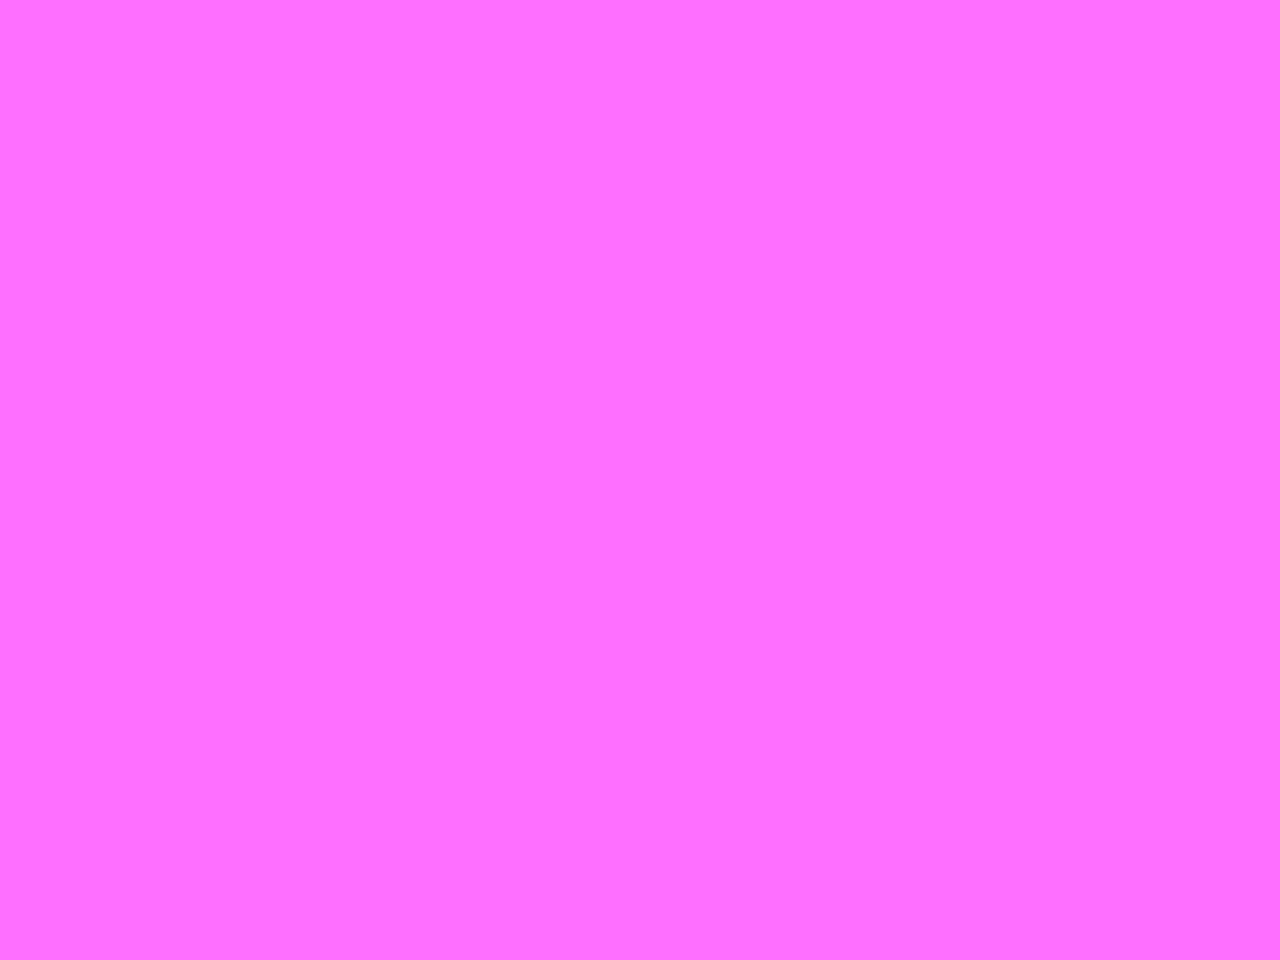 1280x960 Shocking Pink Crayola Solid Color Background